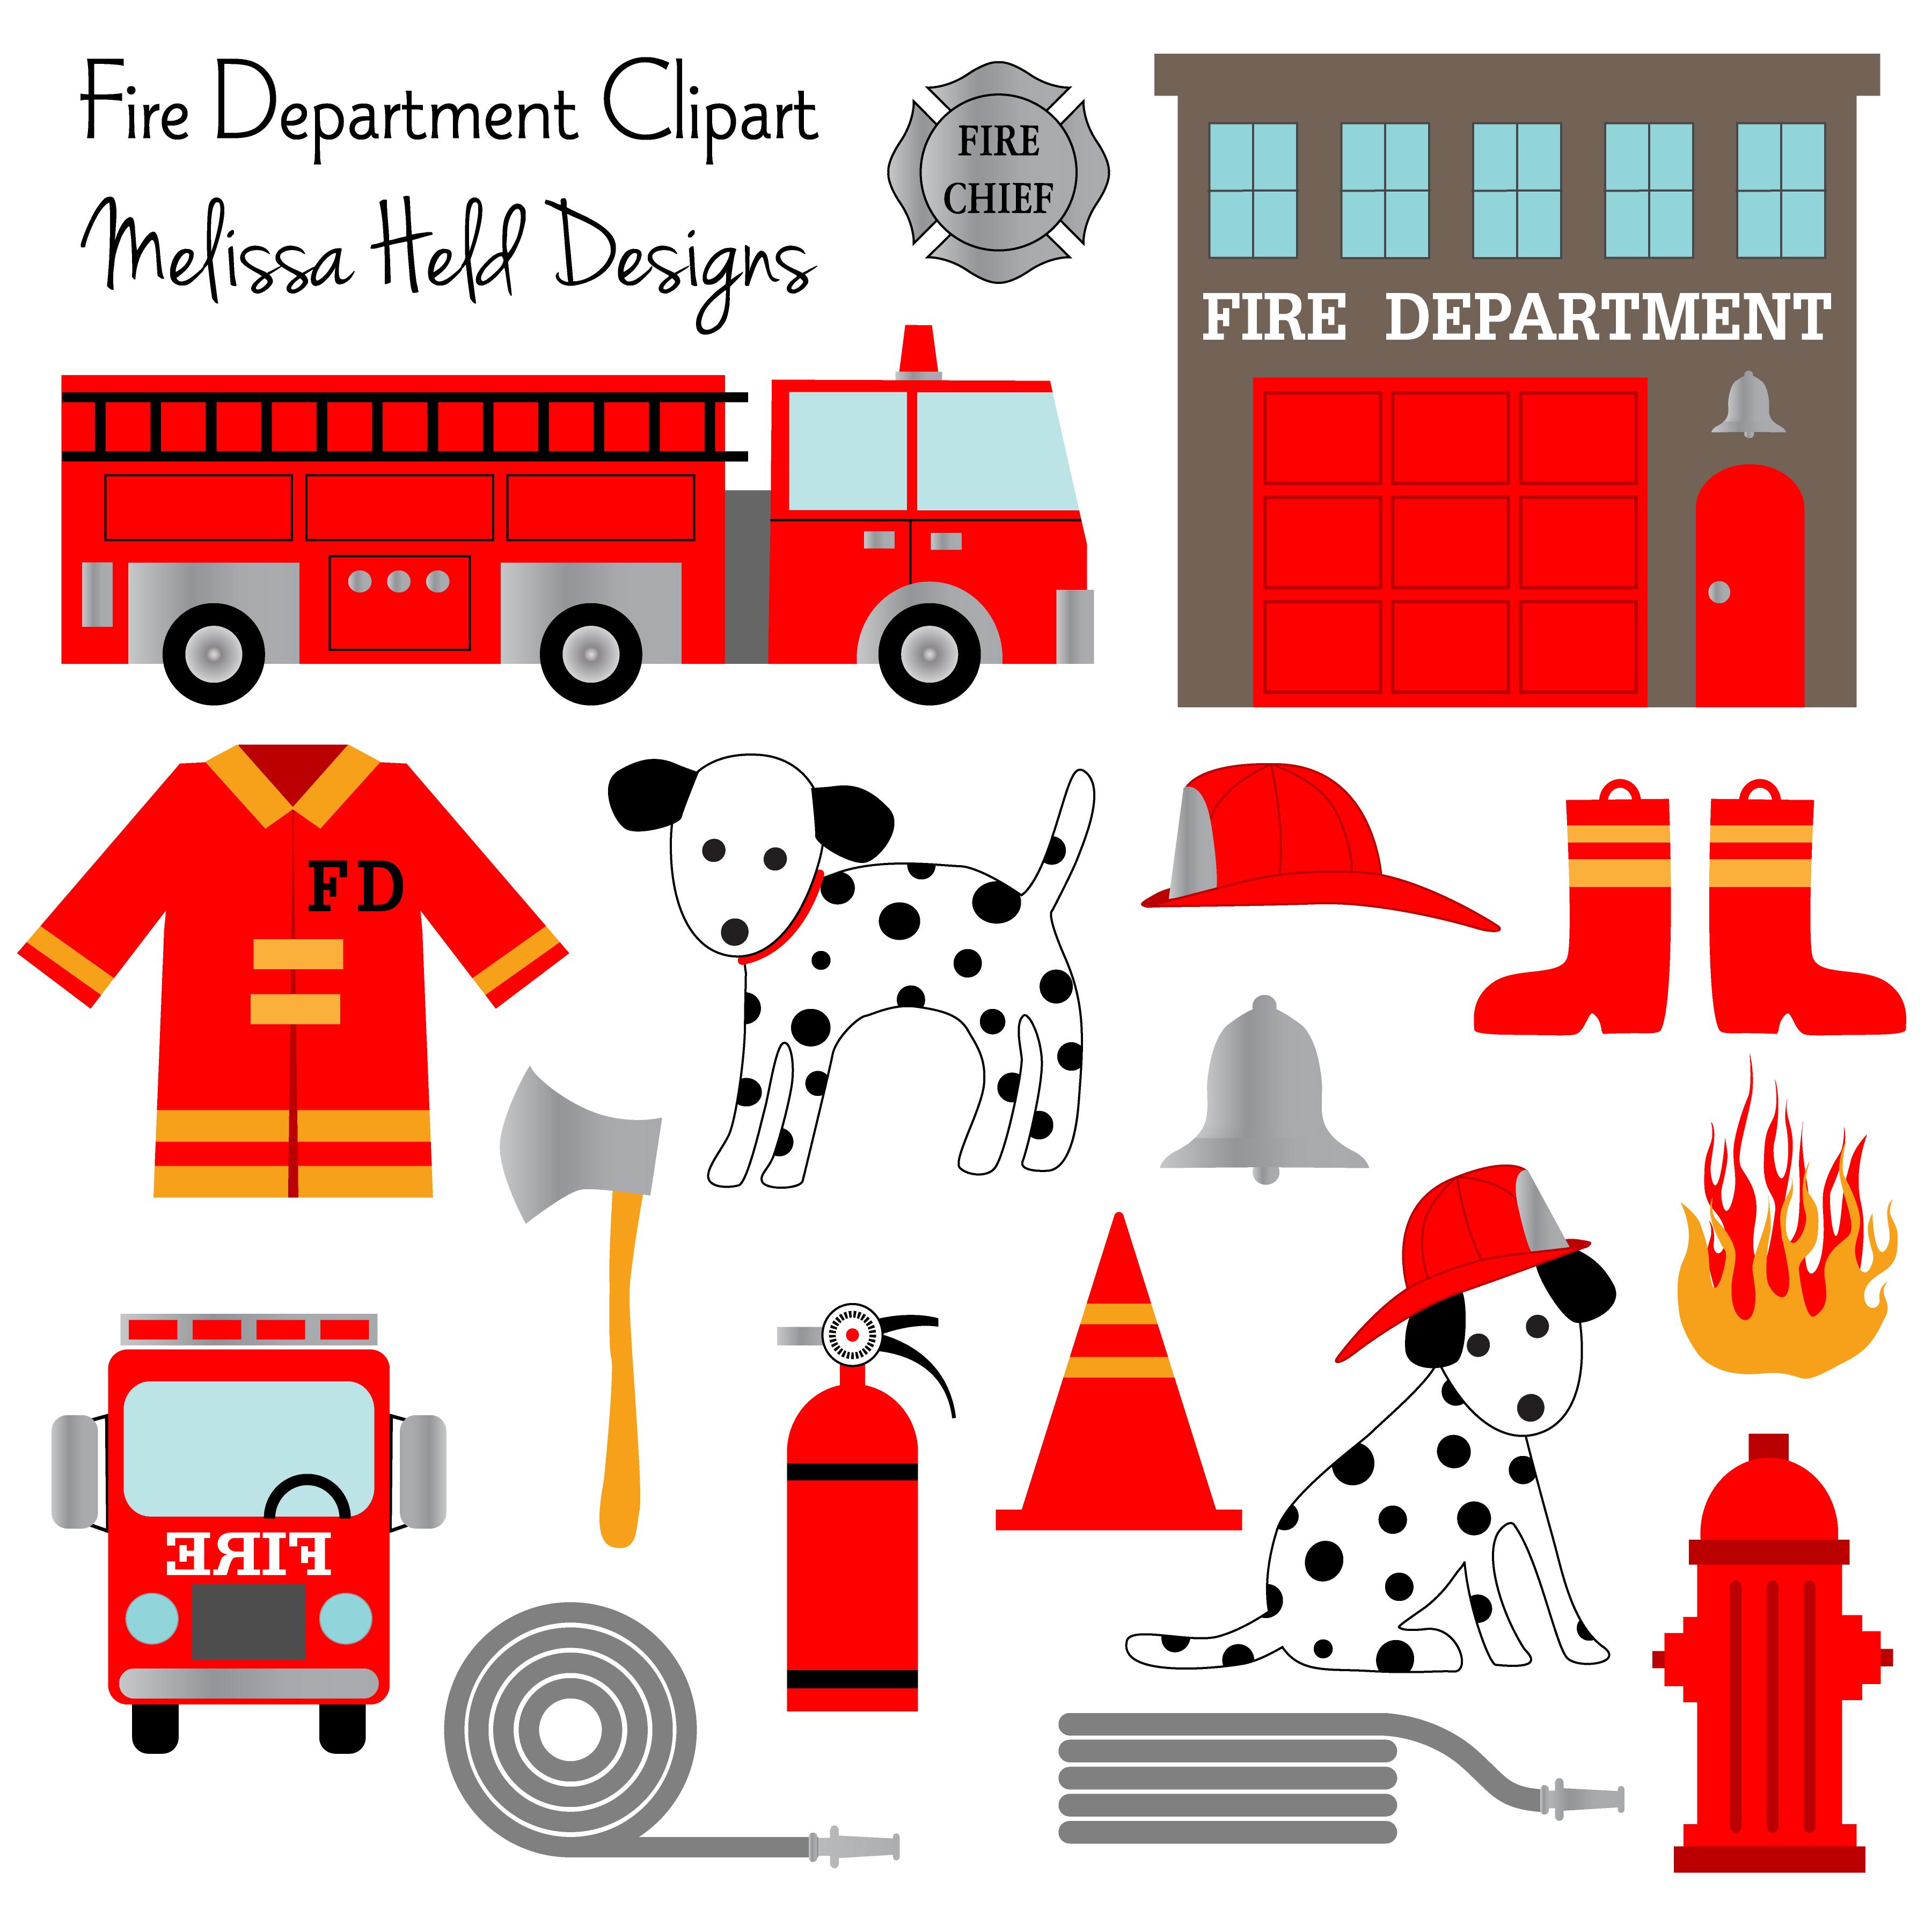 Fire Department Clipart